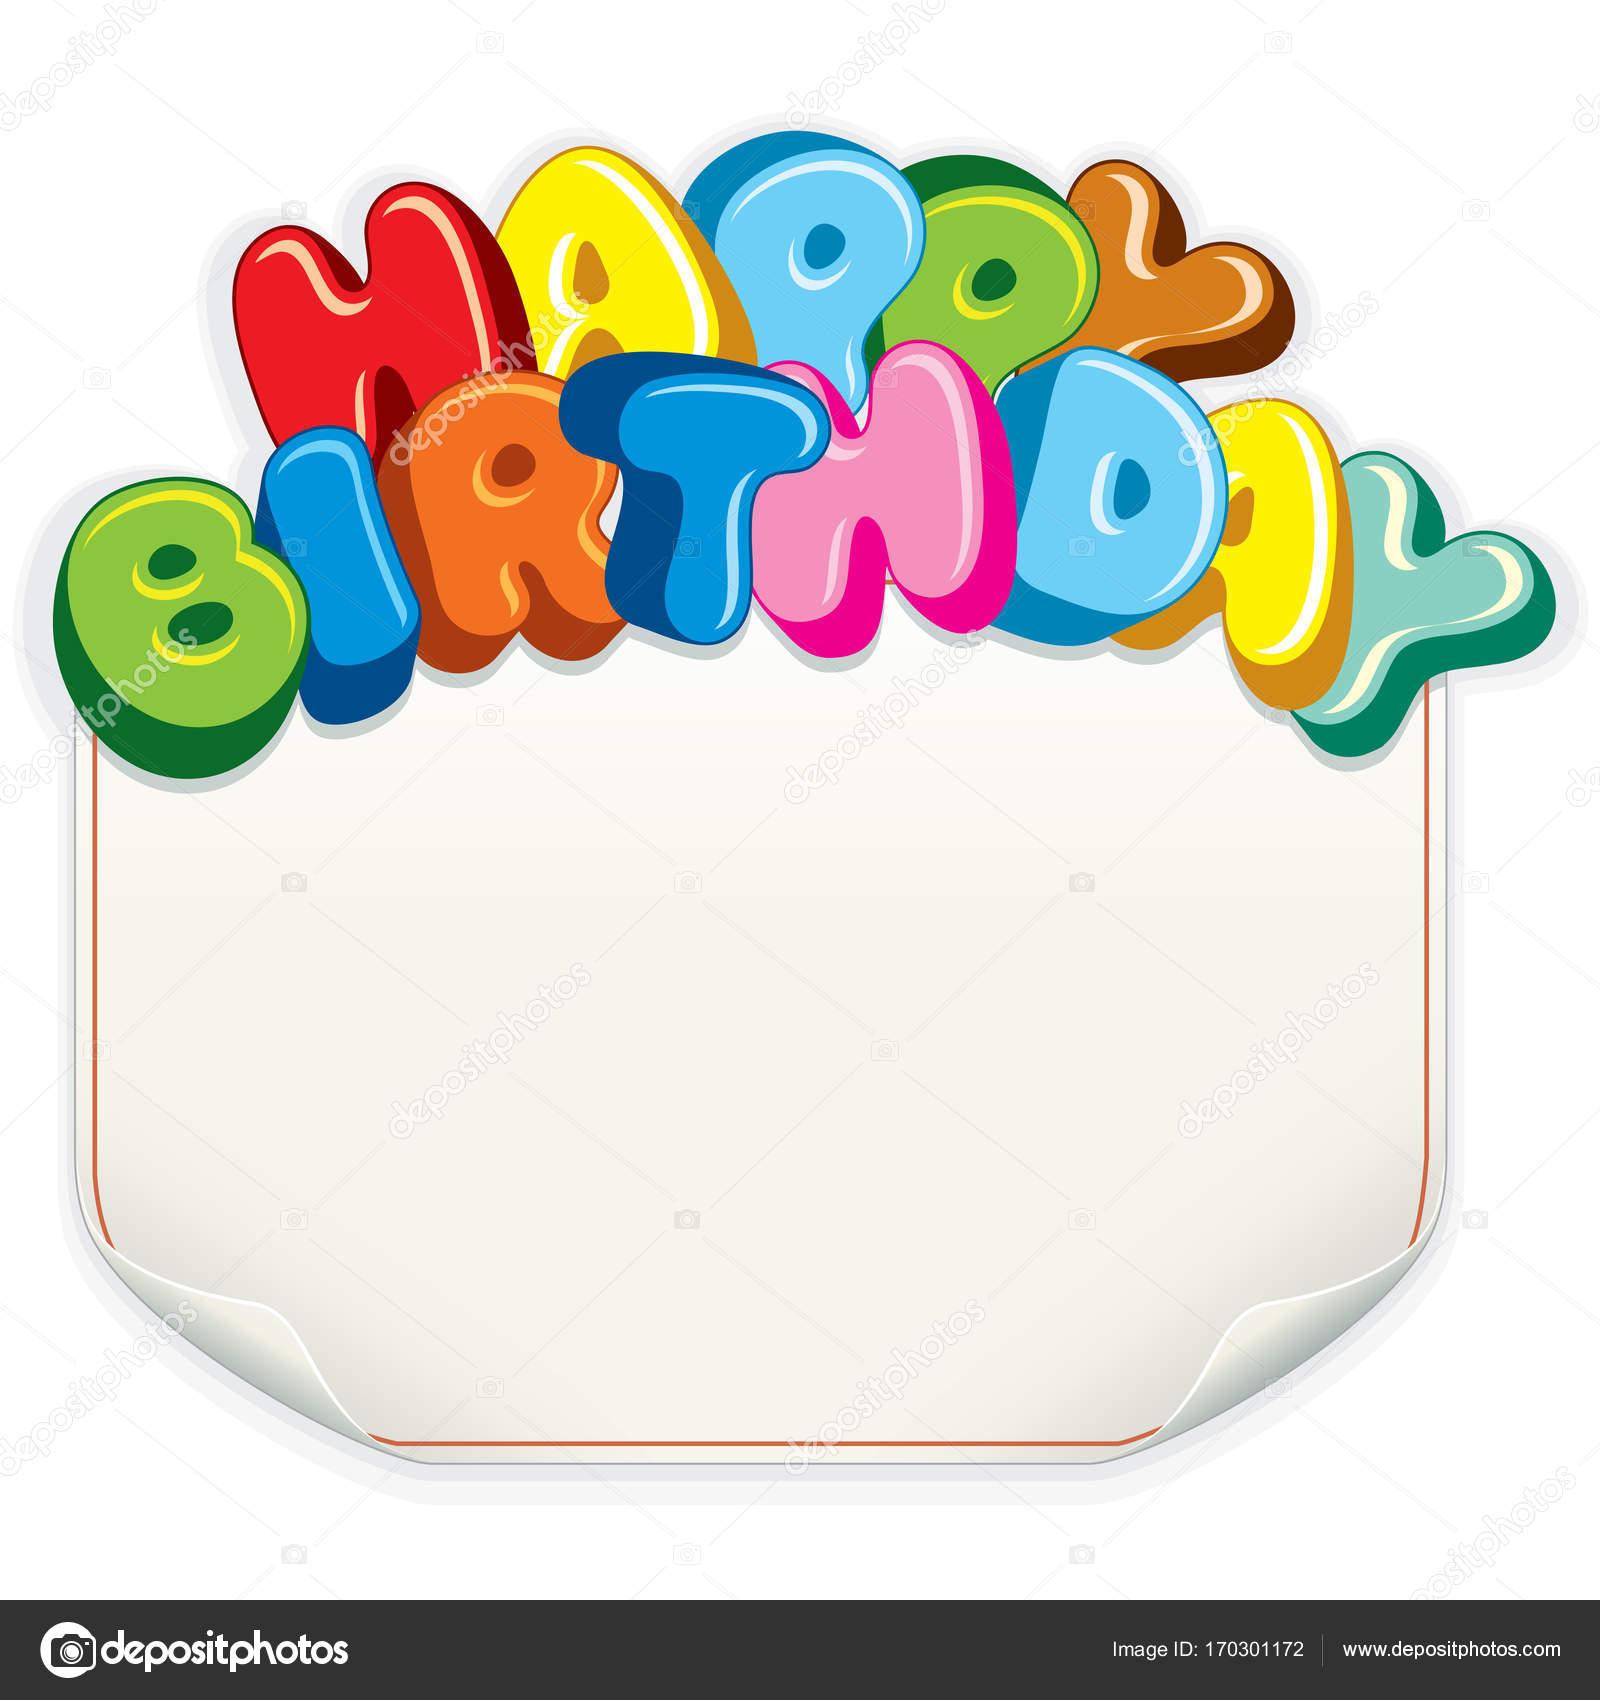 Geburtstag Karte Textvorlage — Stockfoto © PILart #170301172